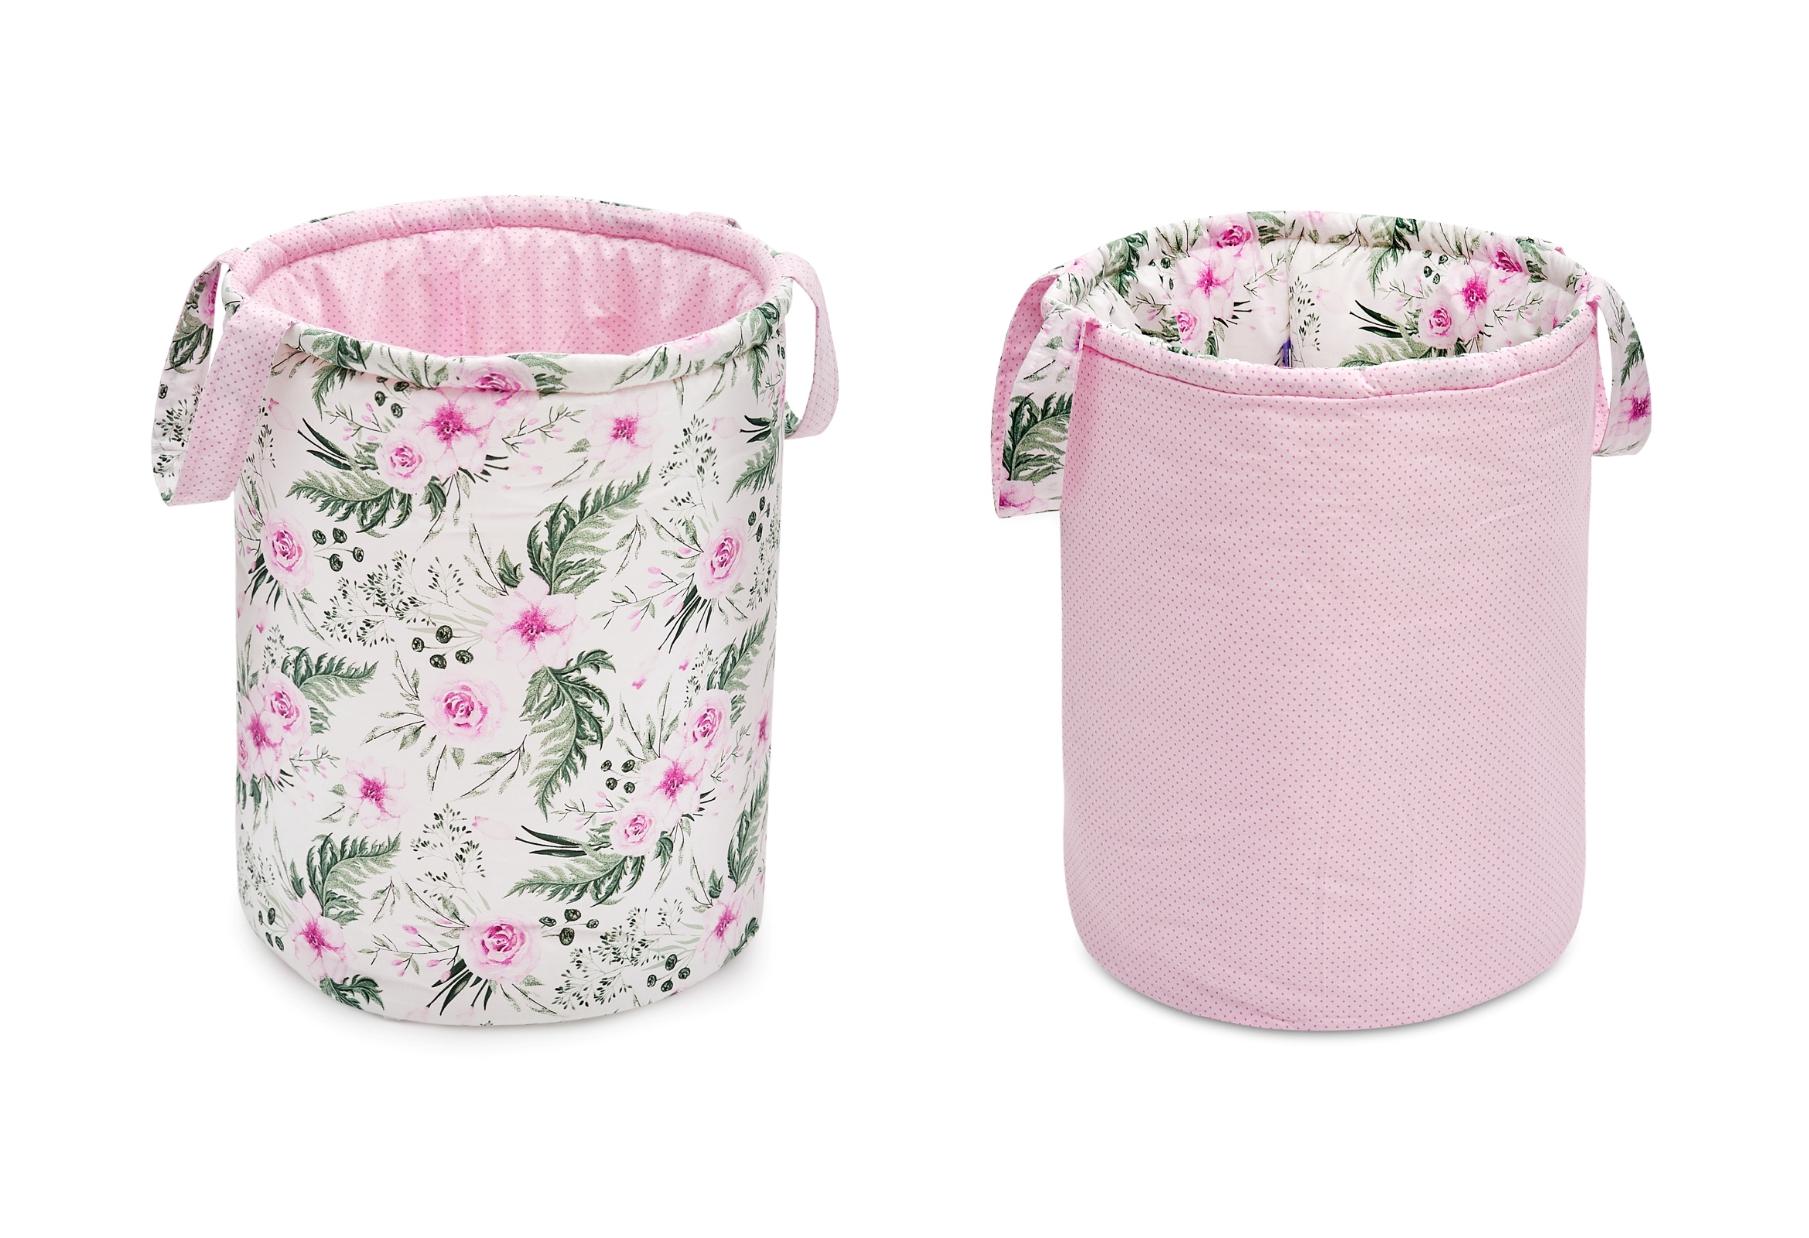 kosz na zabawki dwustronny in garden pink Jukki